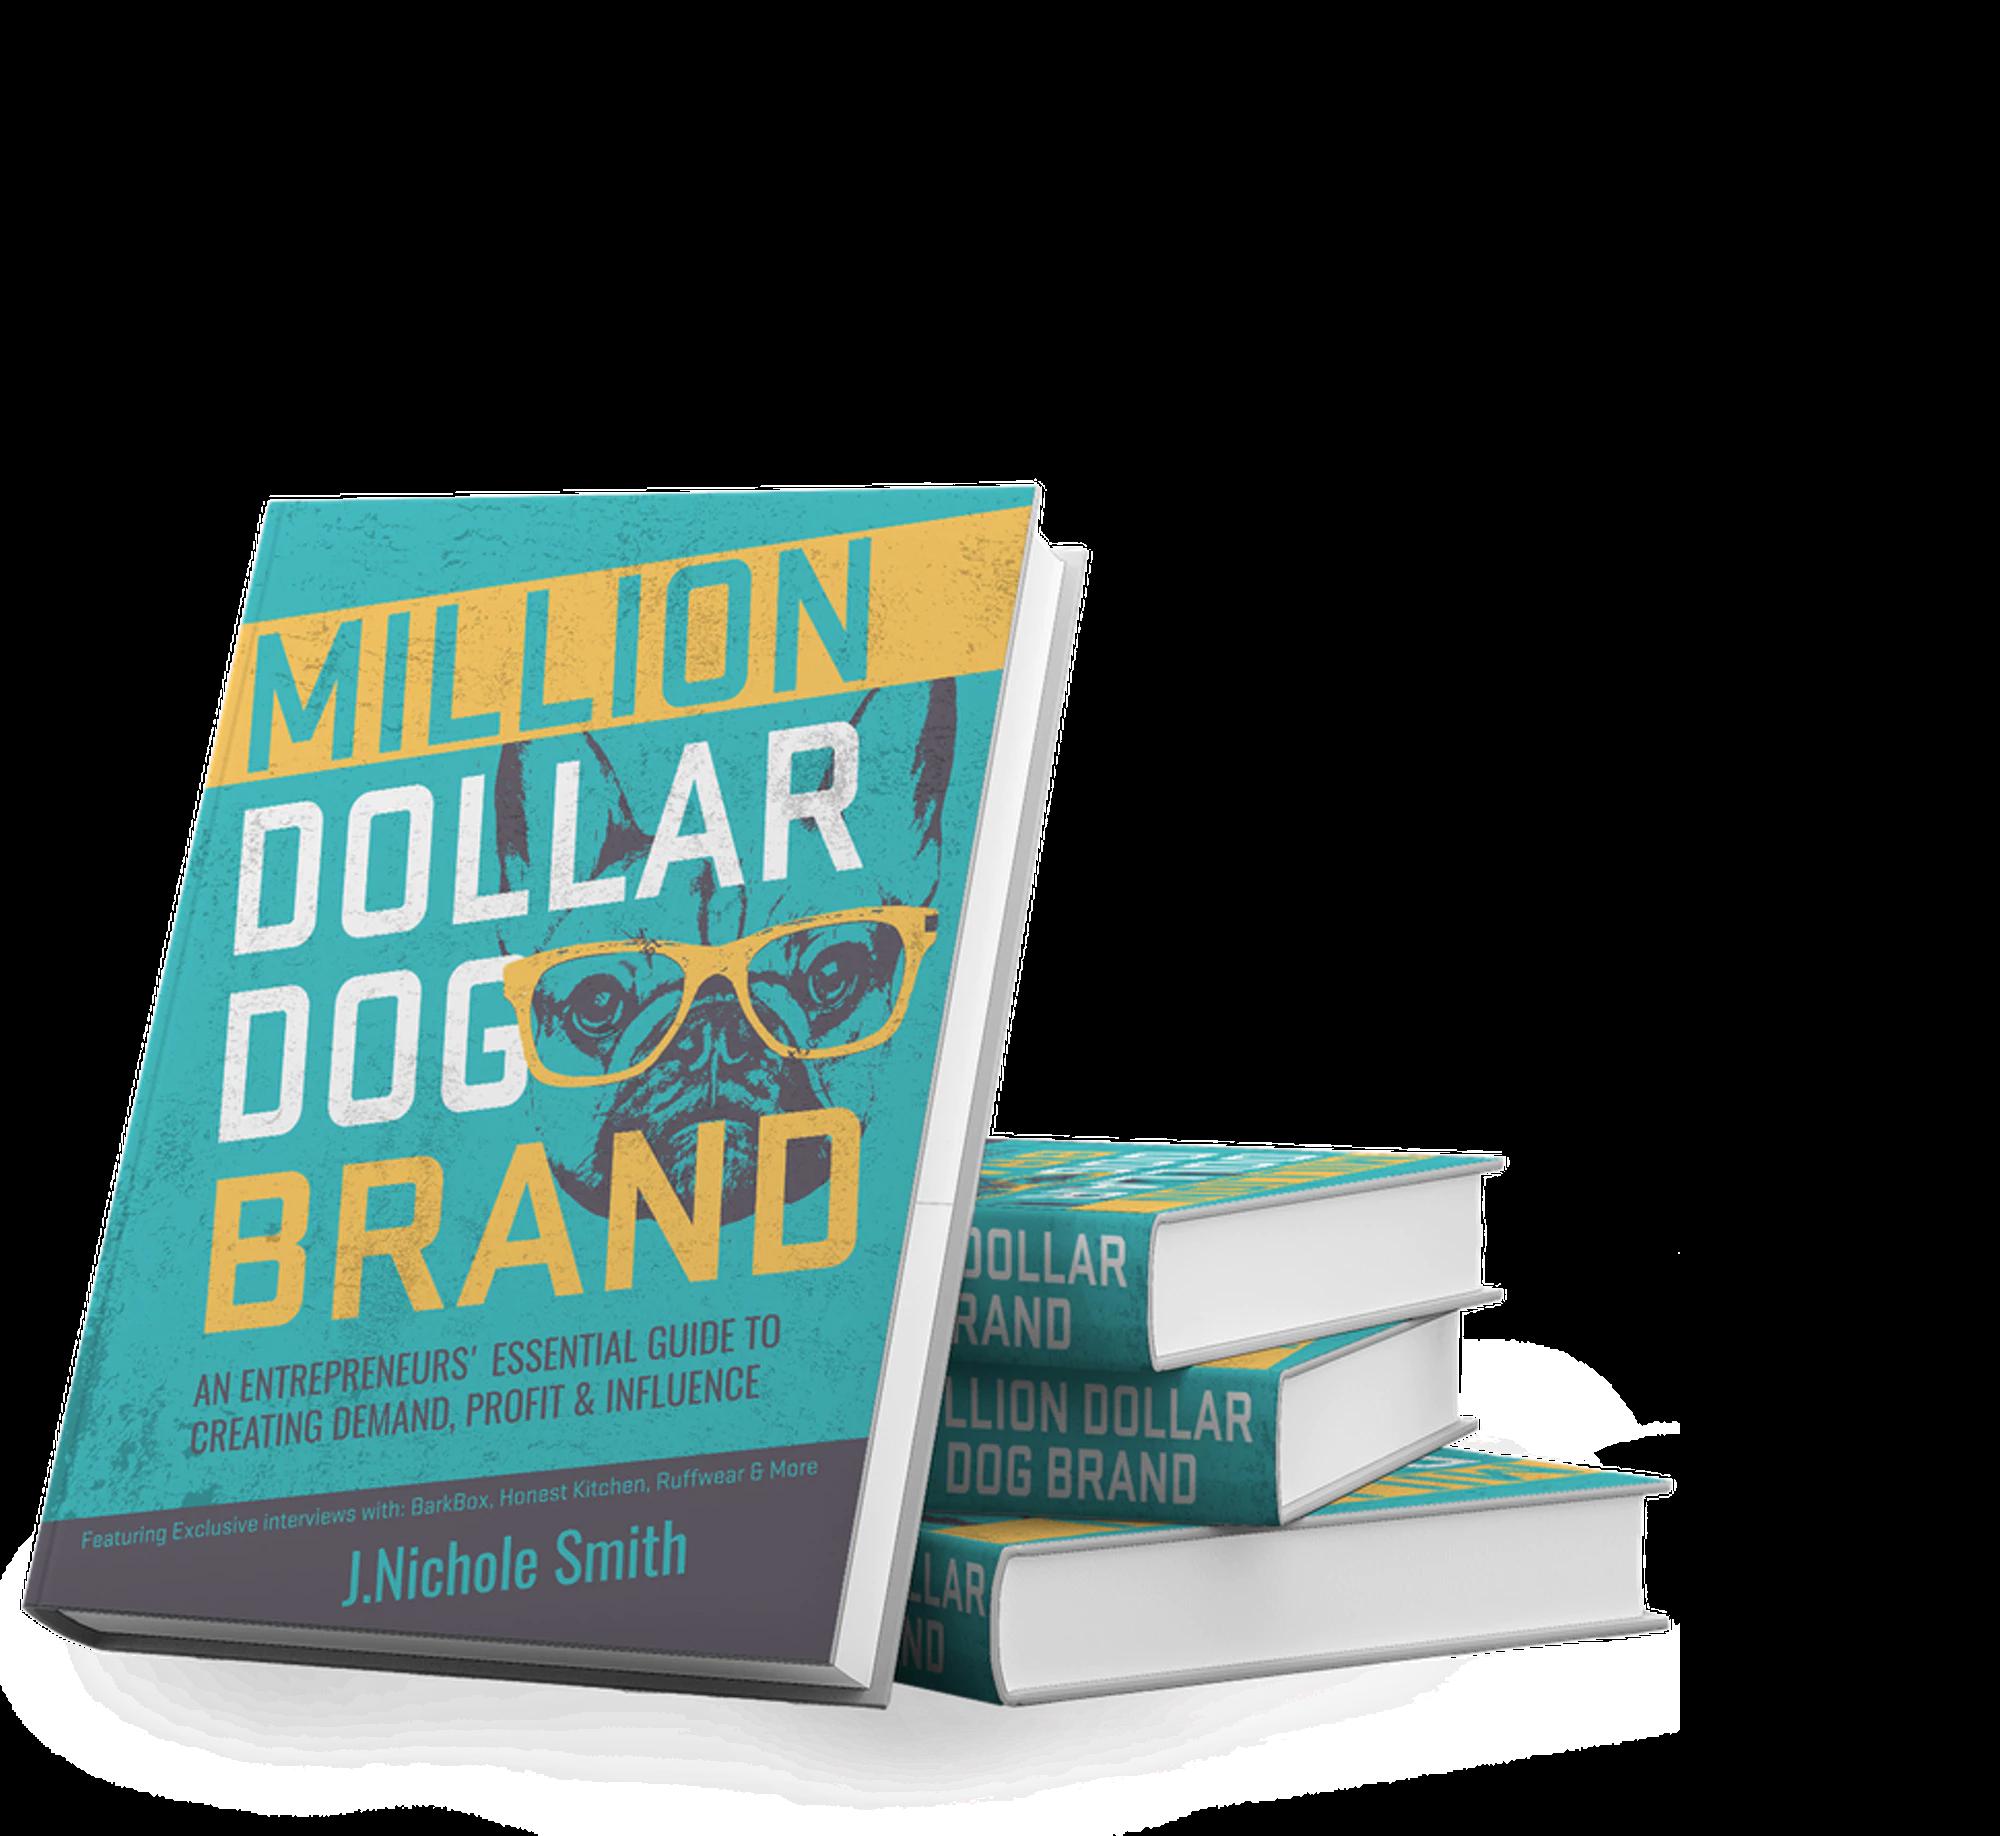 Book Covers and Book Cover Design - Design A Creative Book